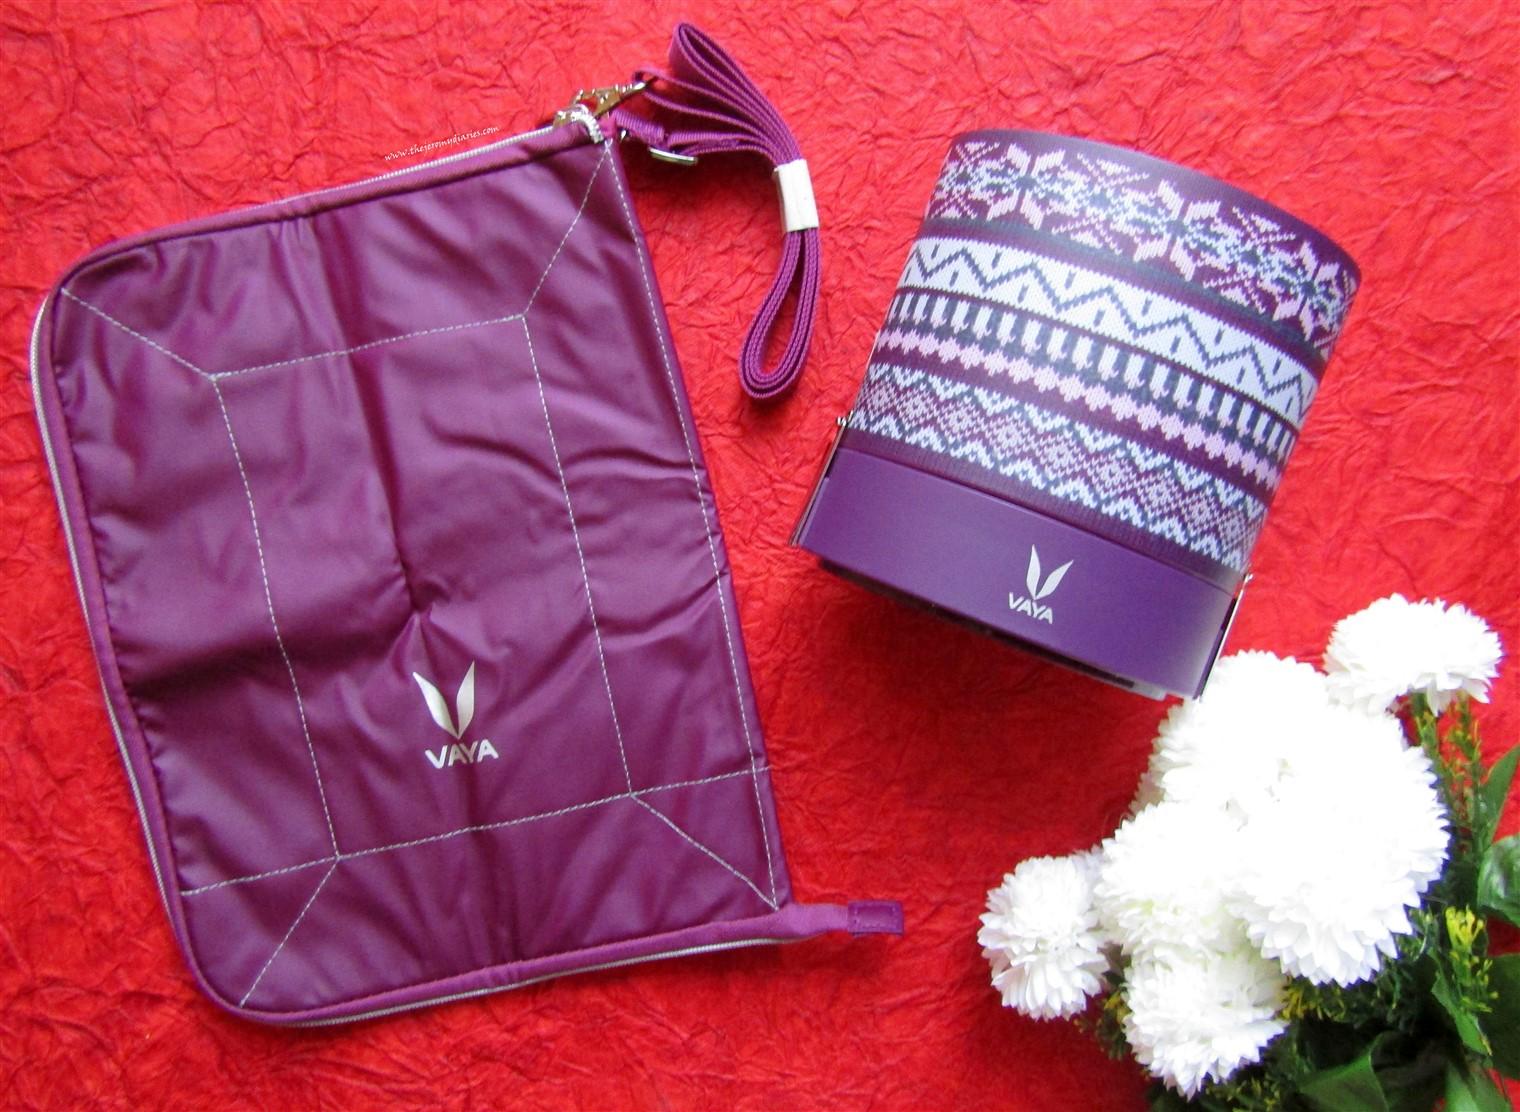 vaya-tyffyn-bagmat-the-jeromy-diaries